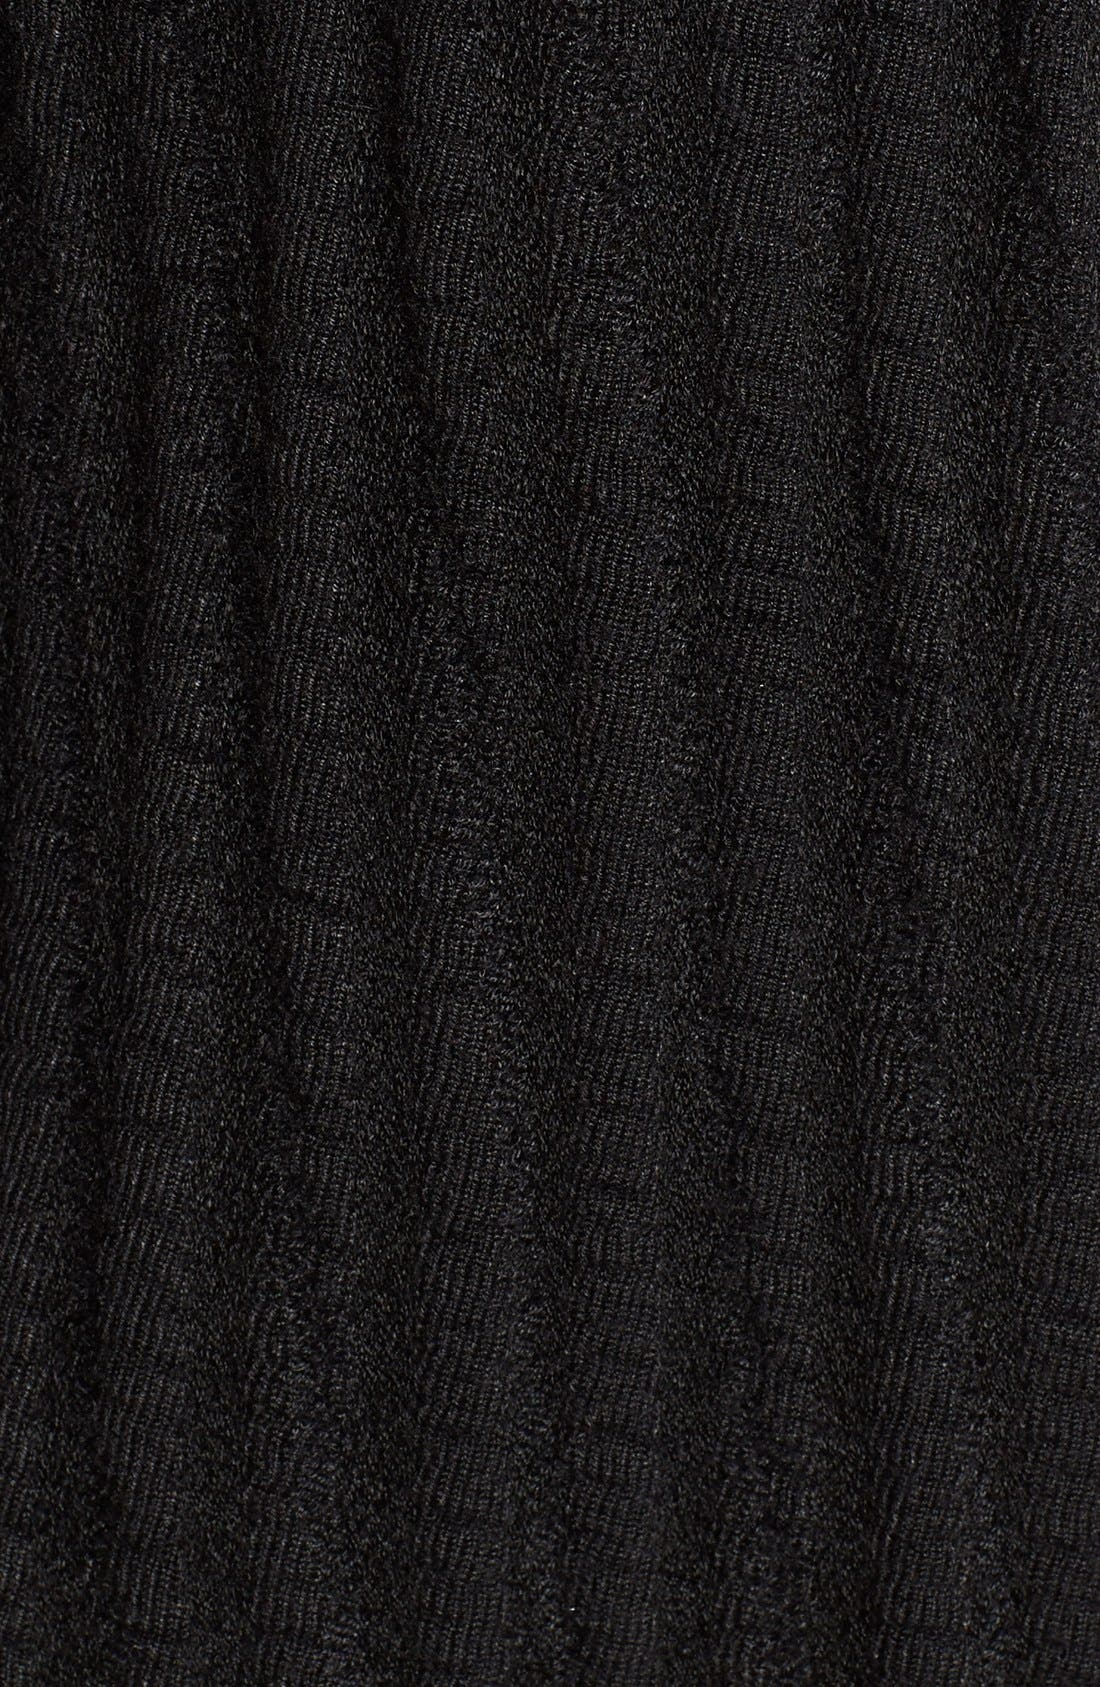 Drape Front Long Sweater Jacket,                             Alternate thumbnail 5, color,                             Black